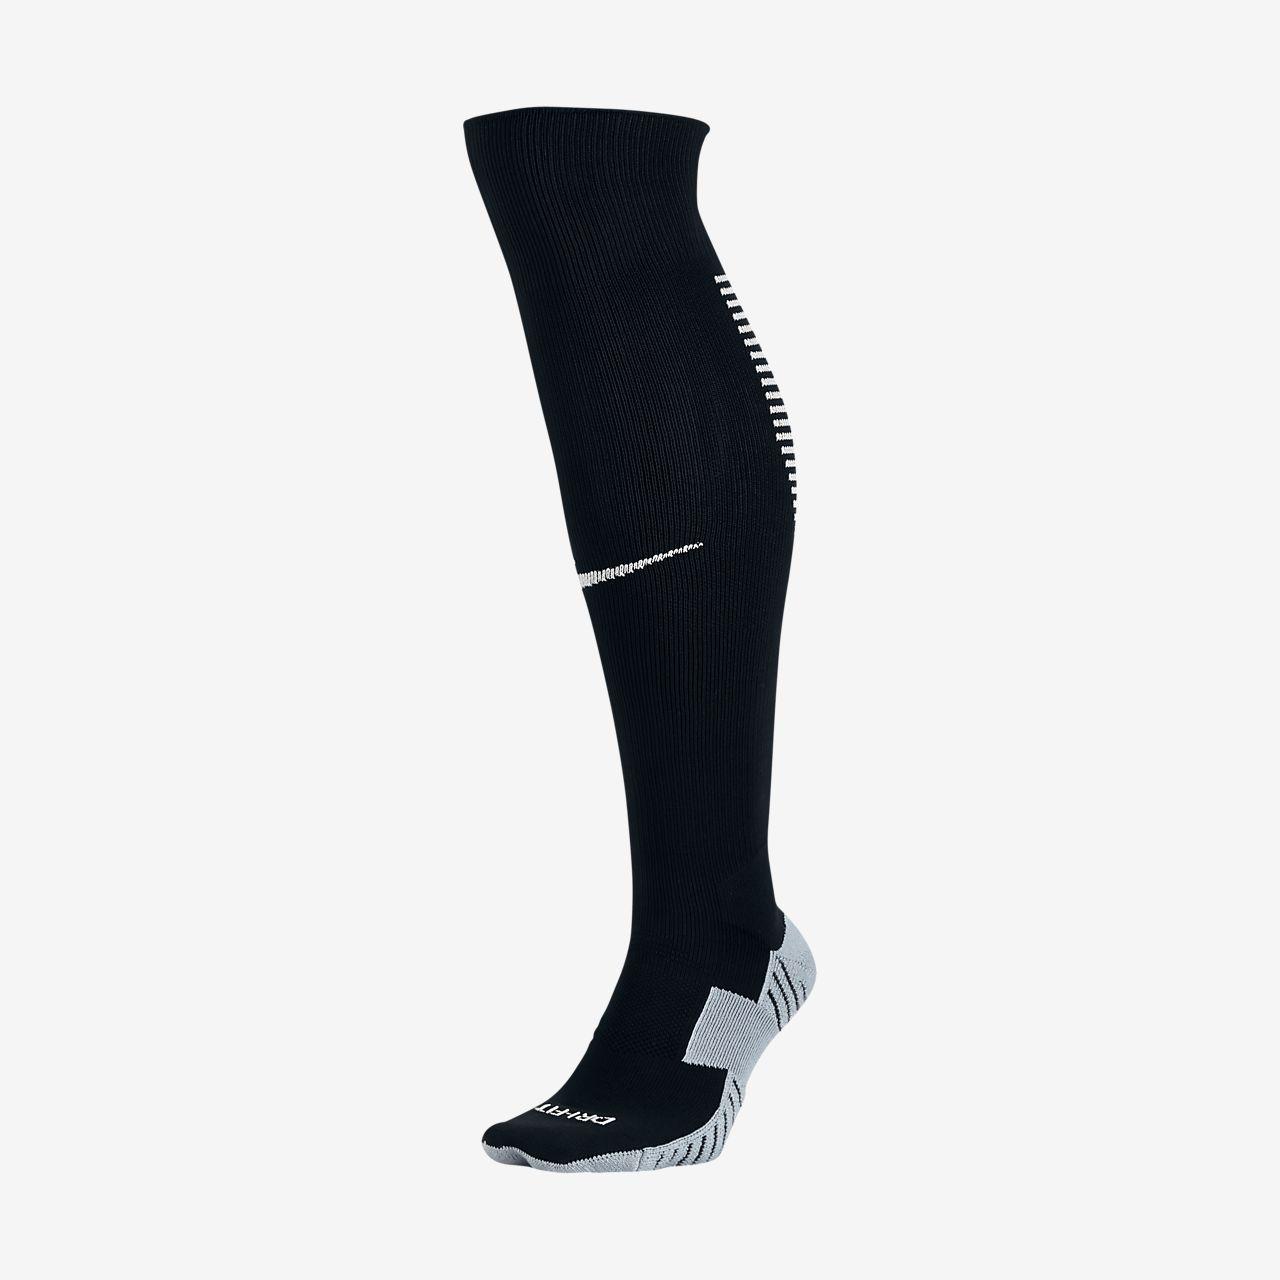 Chaussettes de football Nike Stadium Over-the-Calf